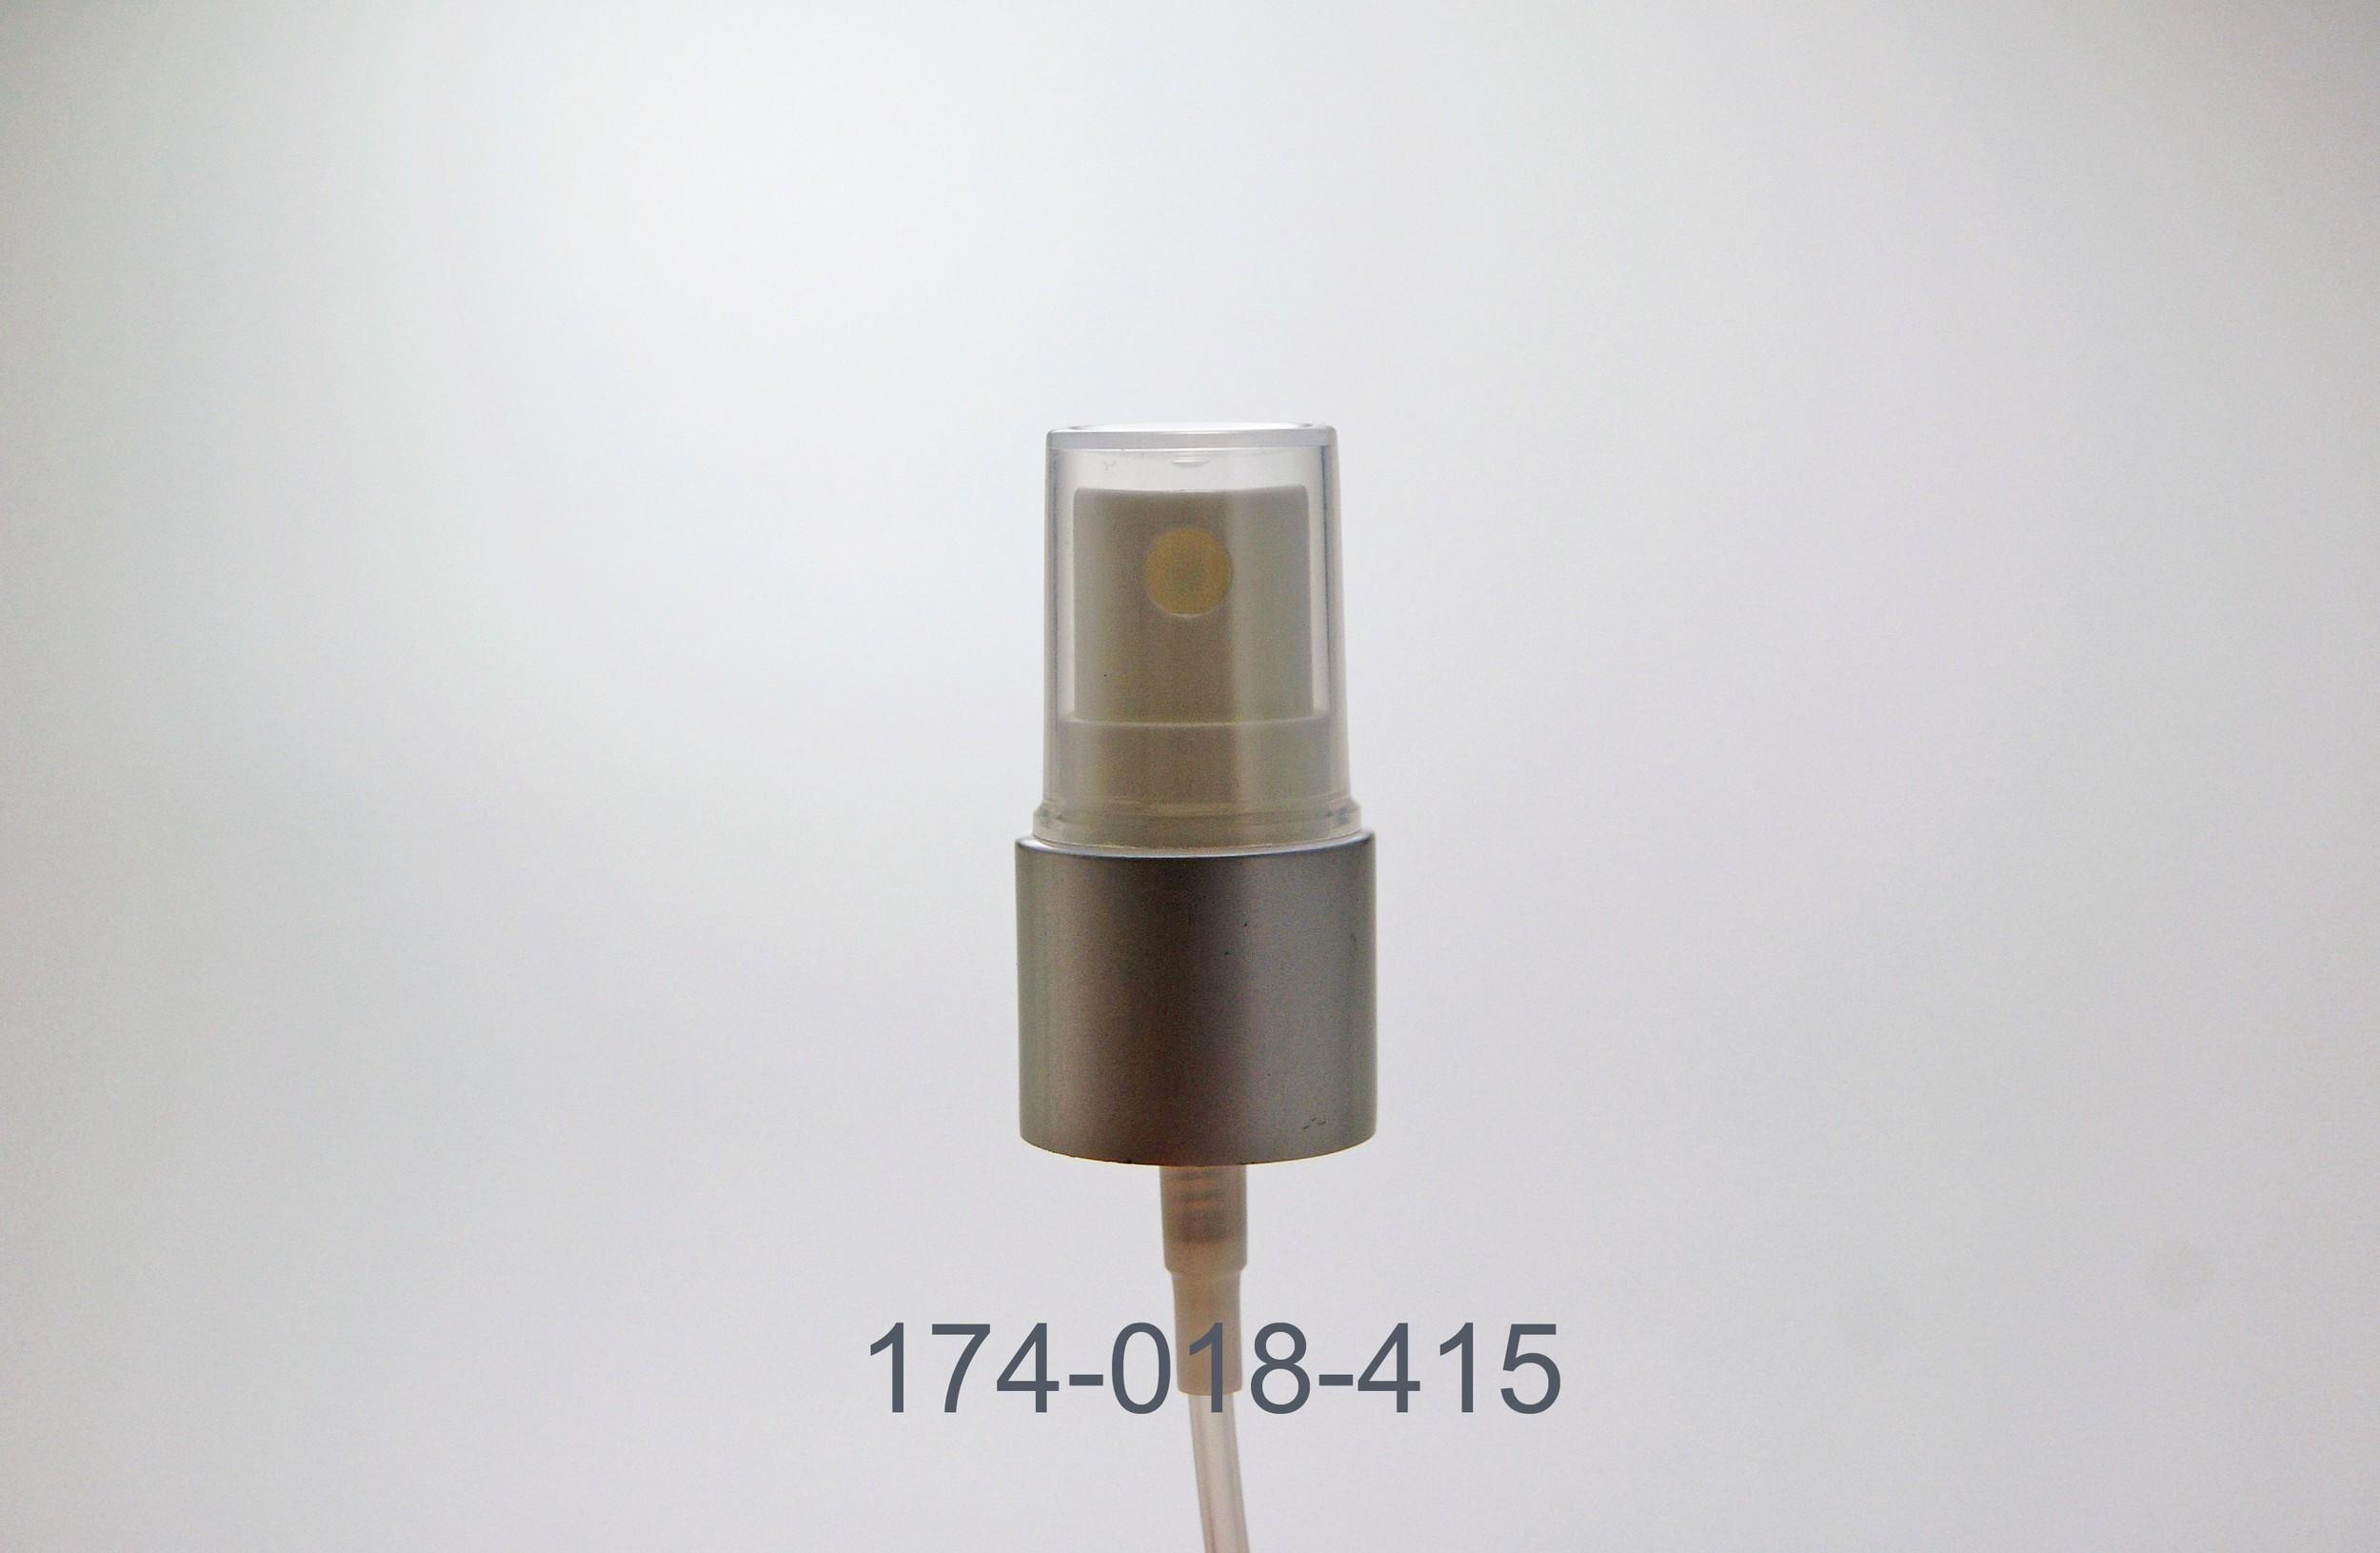 174-018-415 ms.jpg